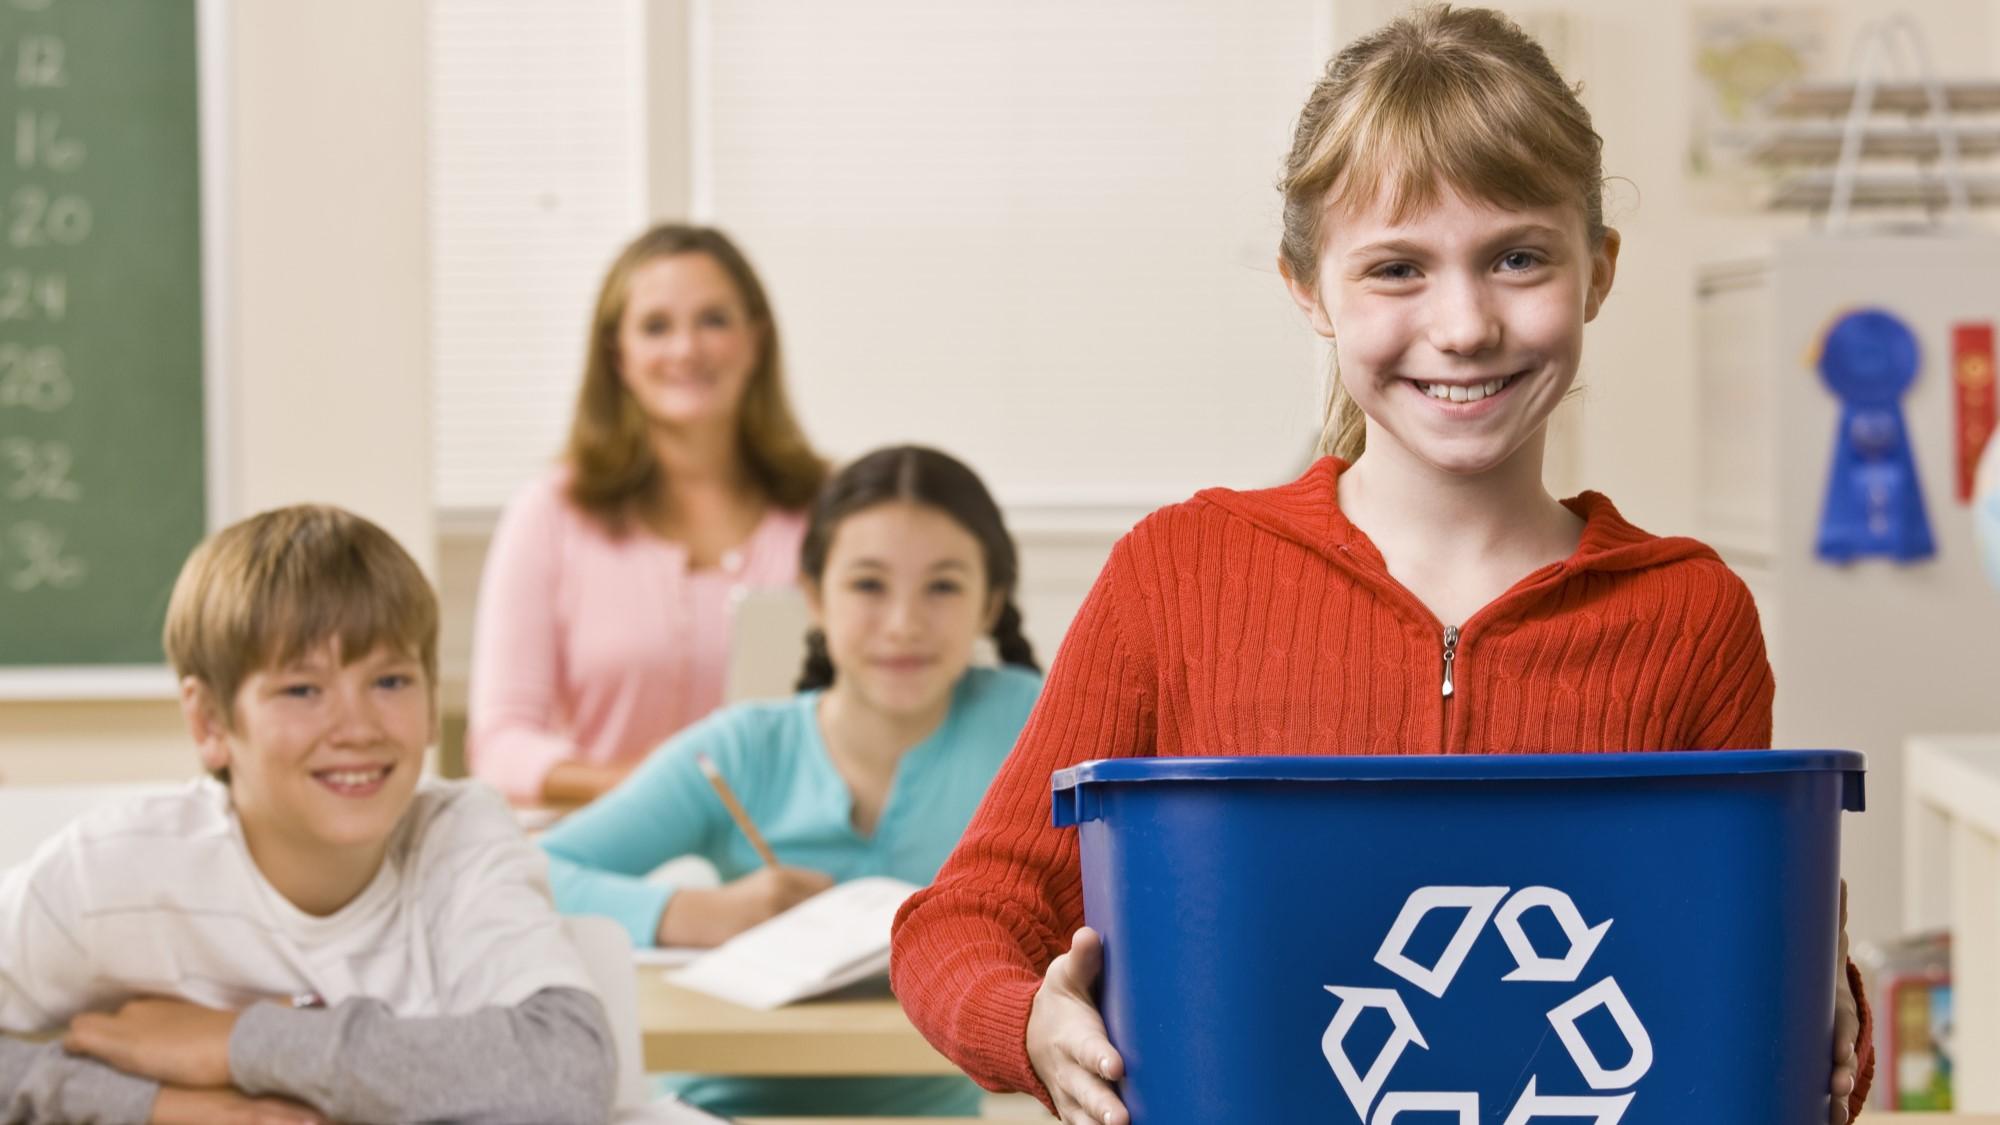 SUEZ ANZ news customer survey student carrying recycling bin